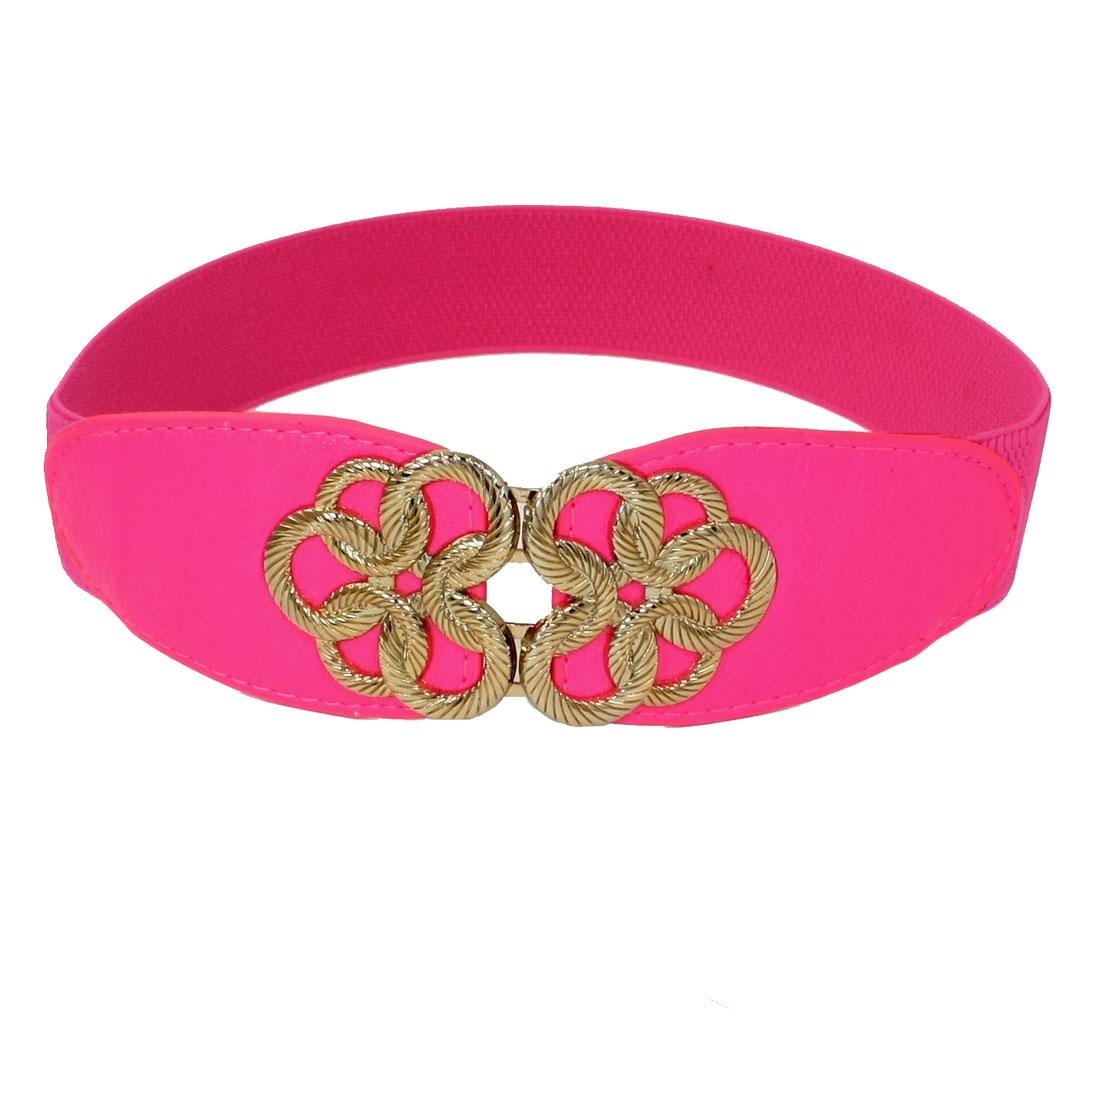 Ladies Knot Shaped Metal Interlocking Buckle Elastic Waist Belt Hot Pink